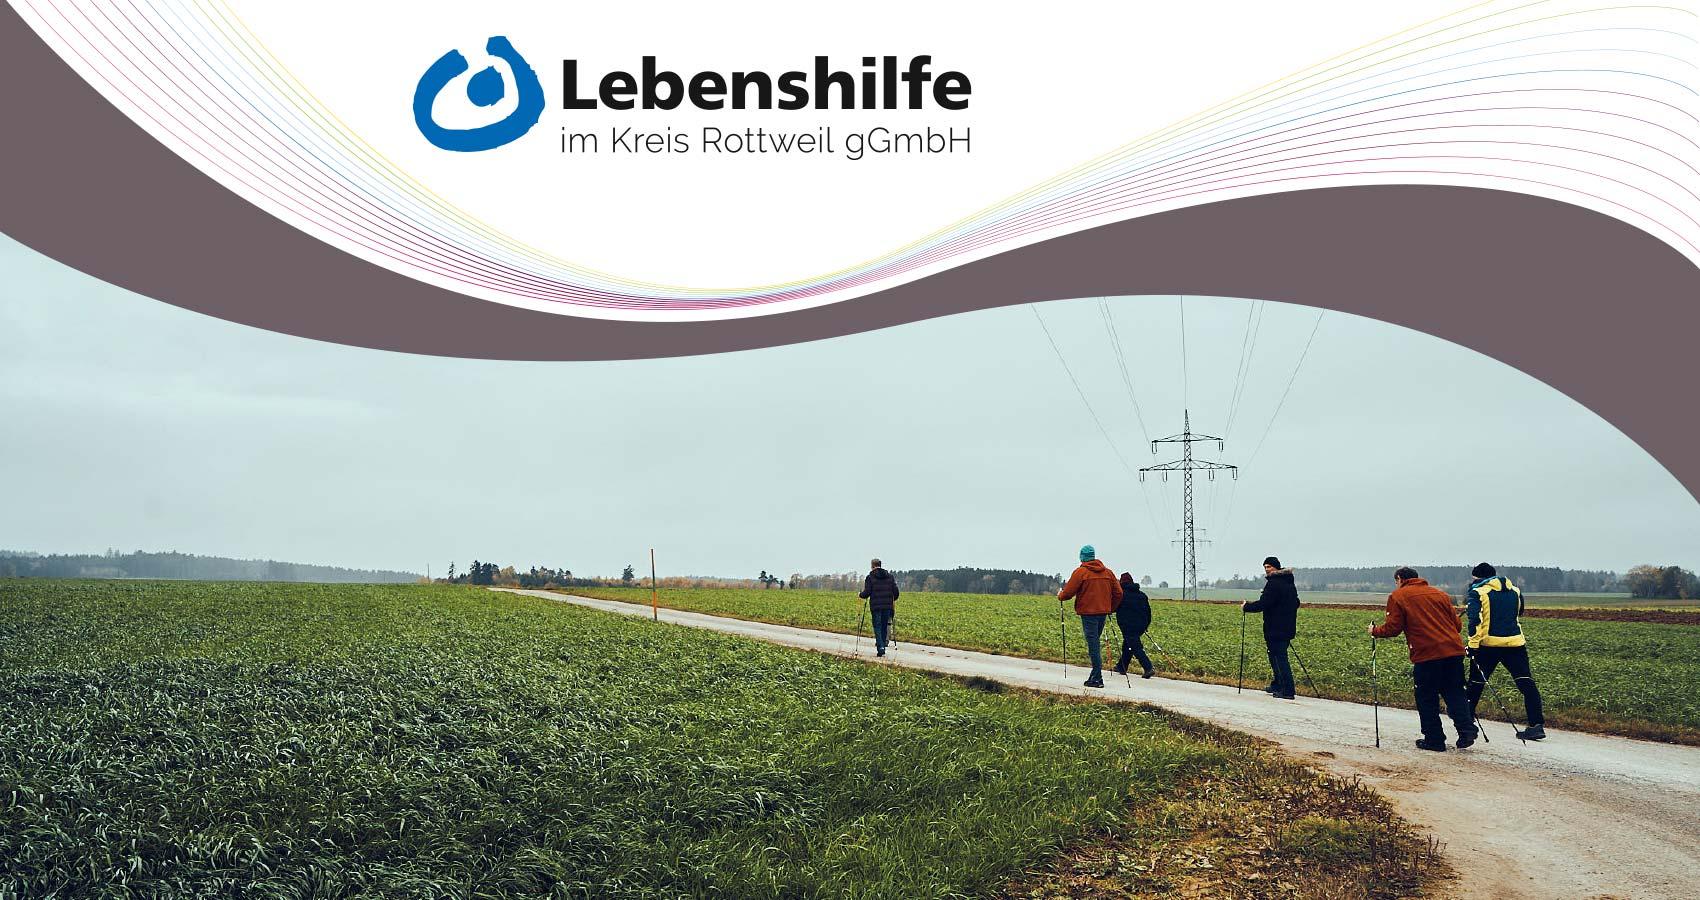 Lebenshilfe im Kreis Rottweil gGmbH - Über uns - Ortsvereine